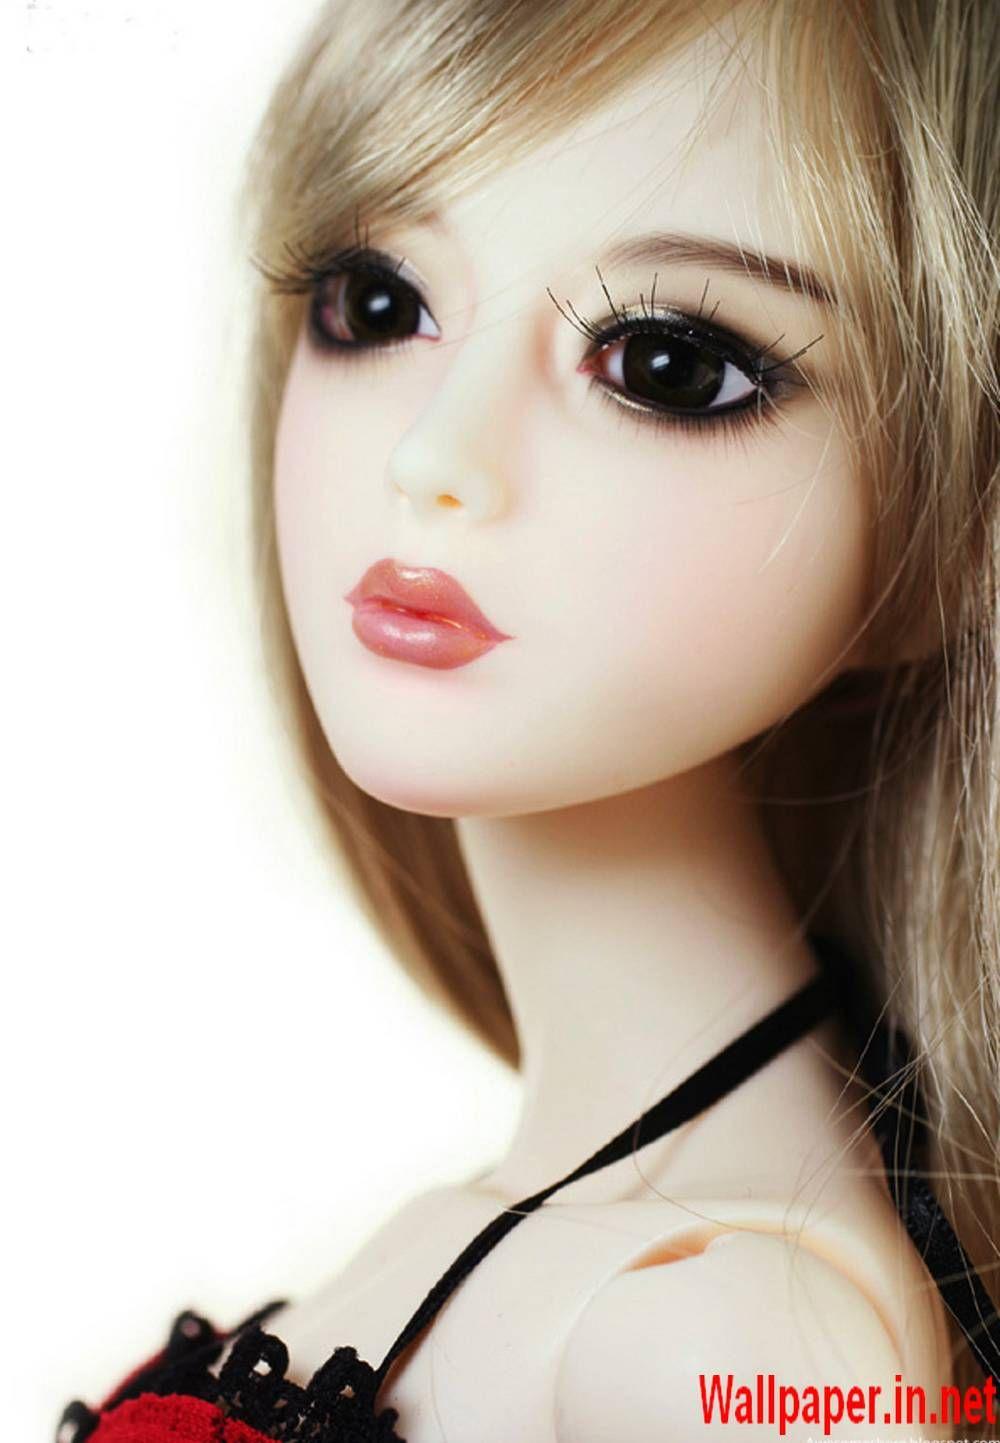 Barbie Princesa Pop Star Hd Wallpaper Wallpapers Dolls Cute